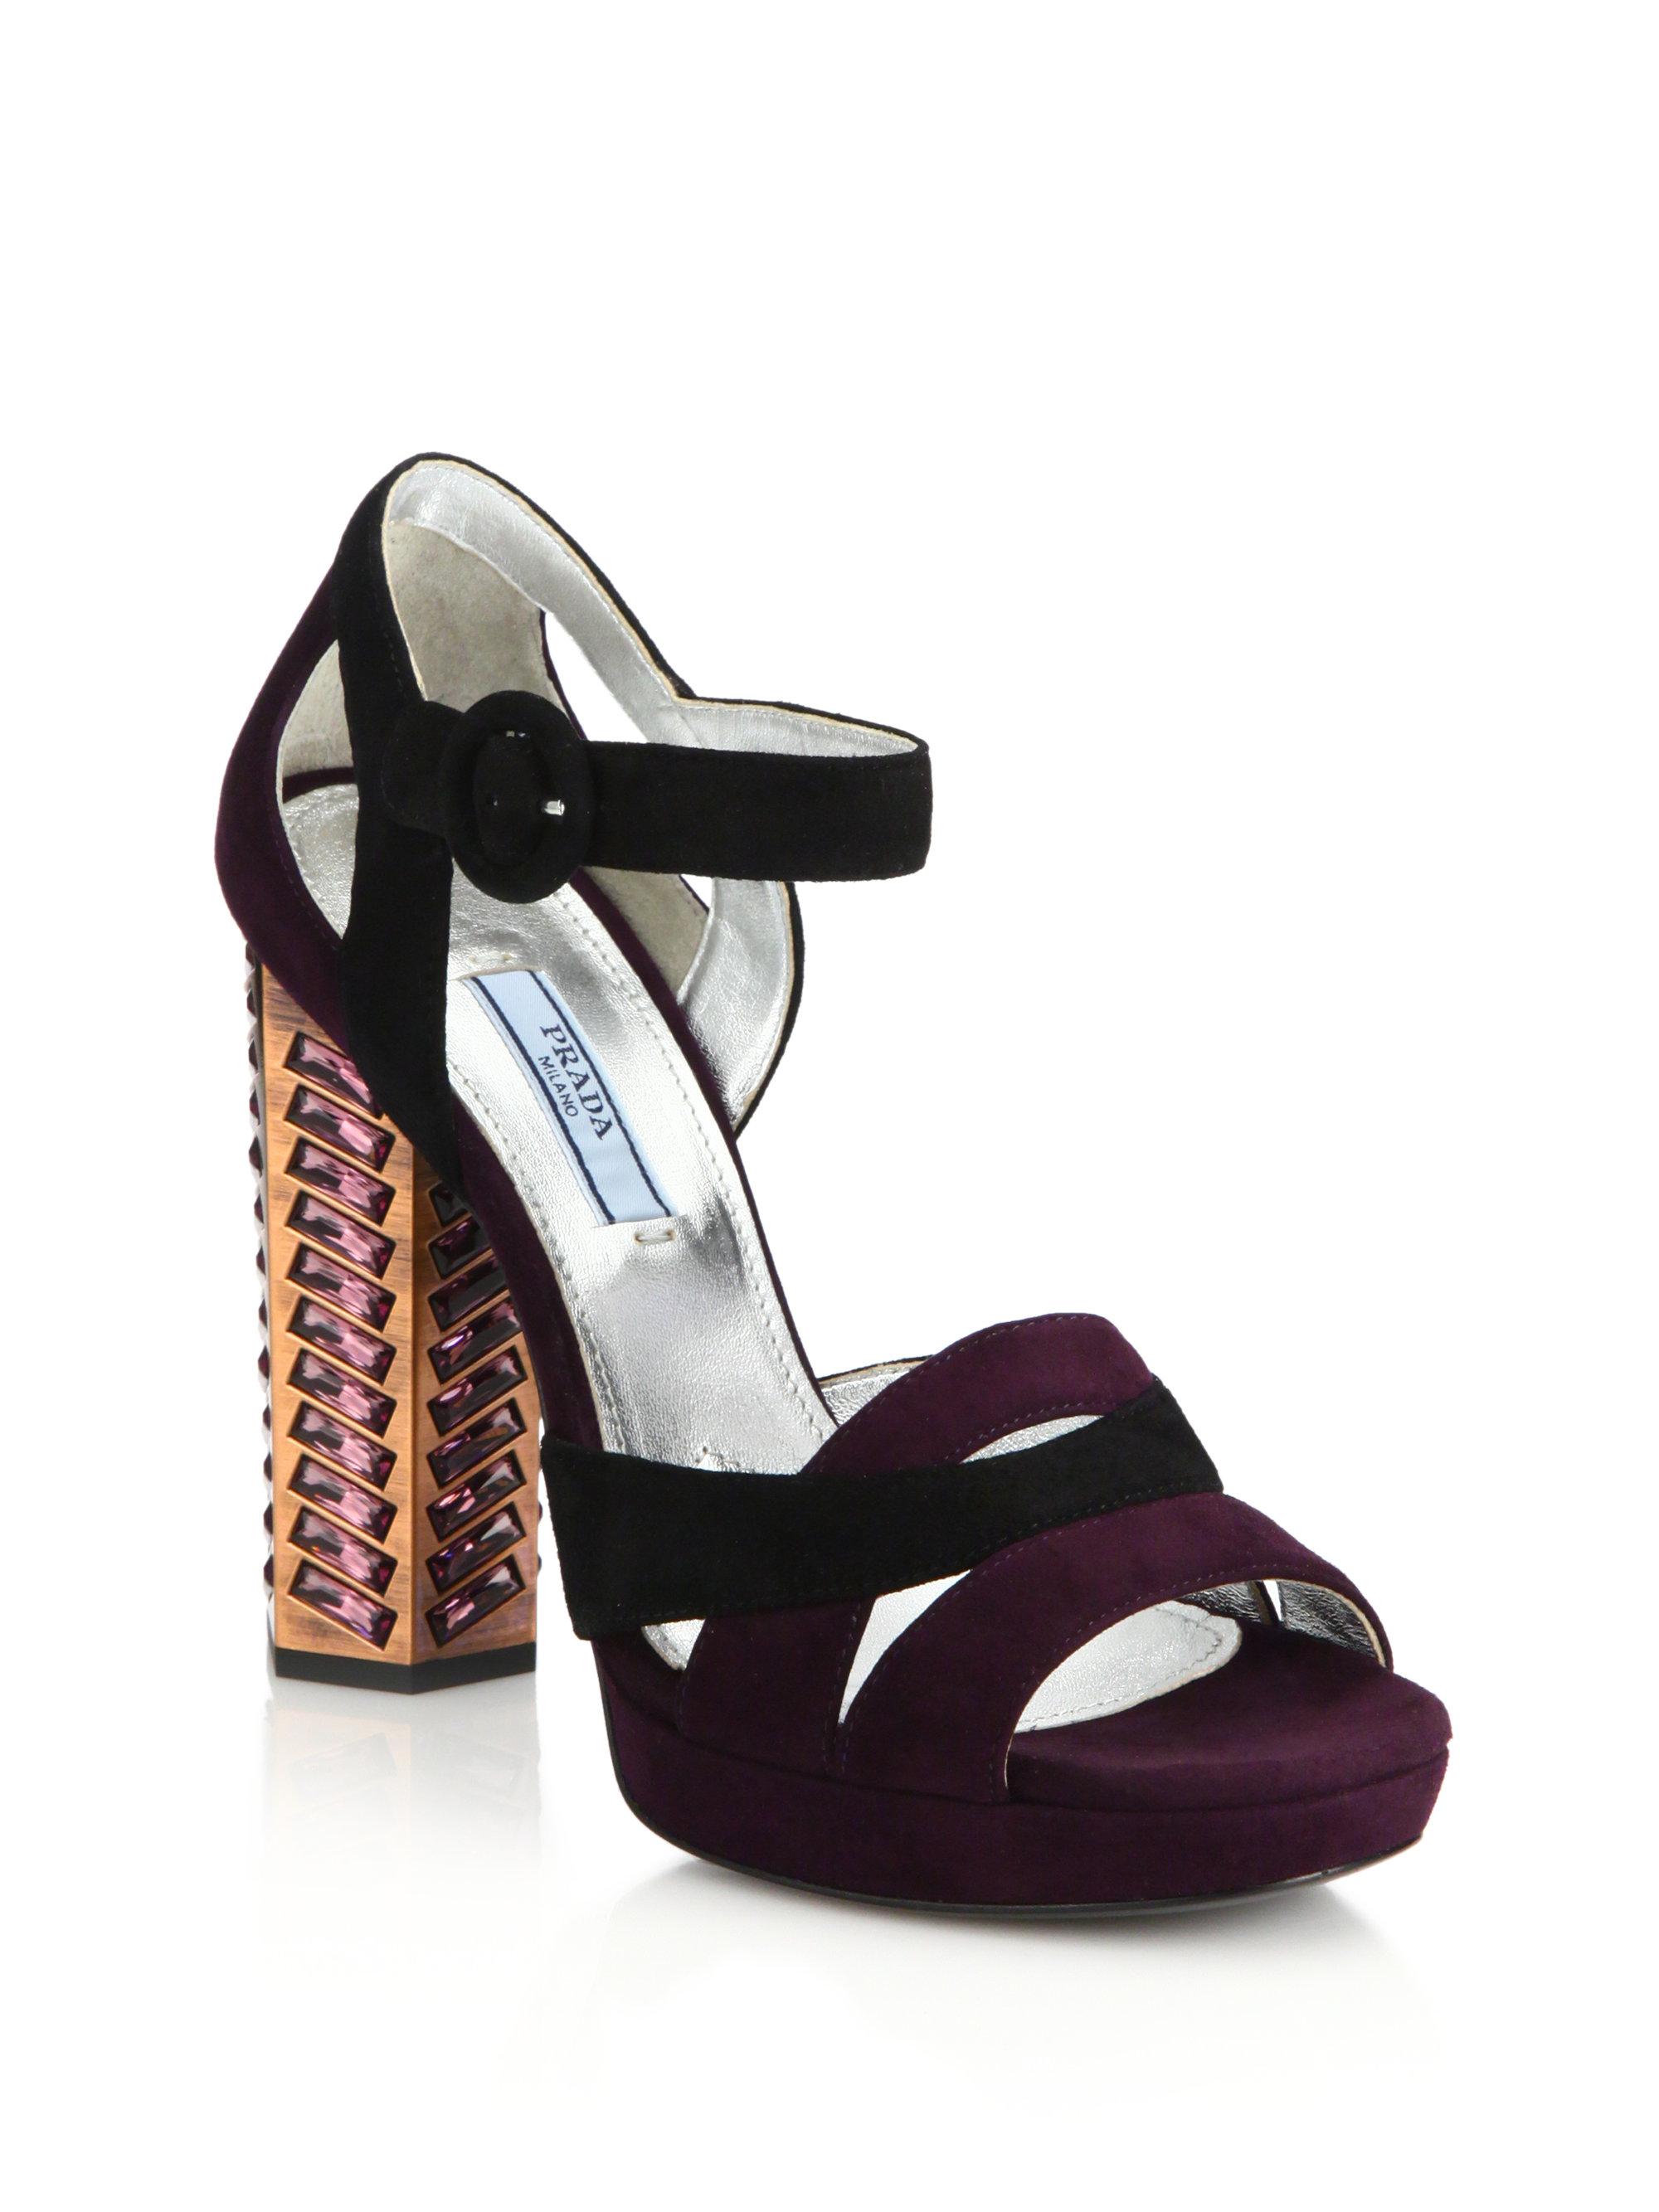 Lyst Prada Jeweled Suede Sandals In Purple